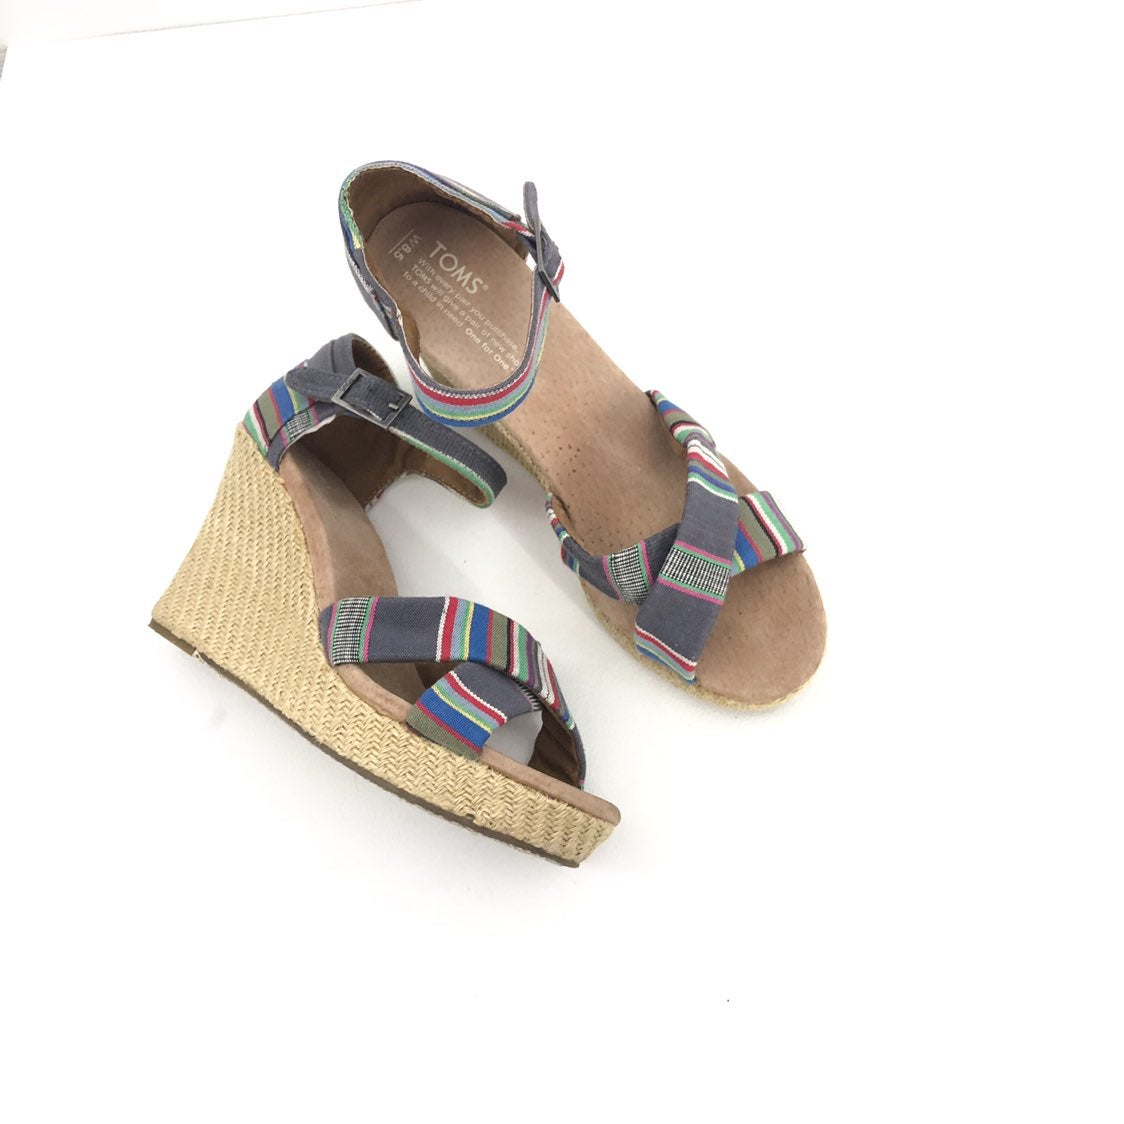 TOMS fabric espadrille Wedge Heel Size 8